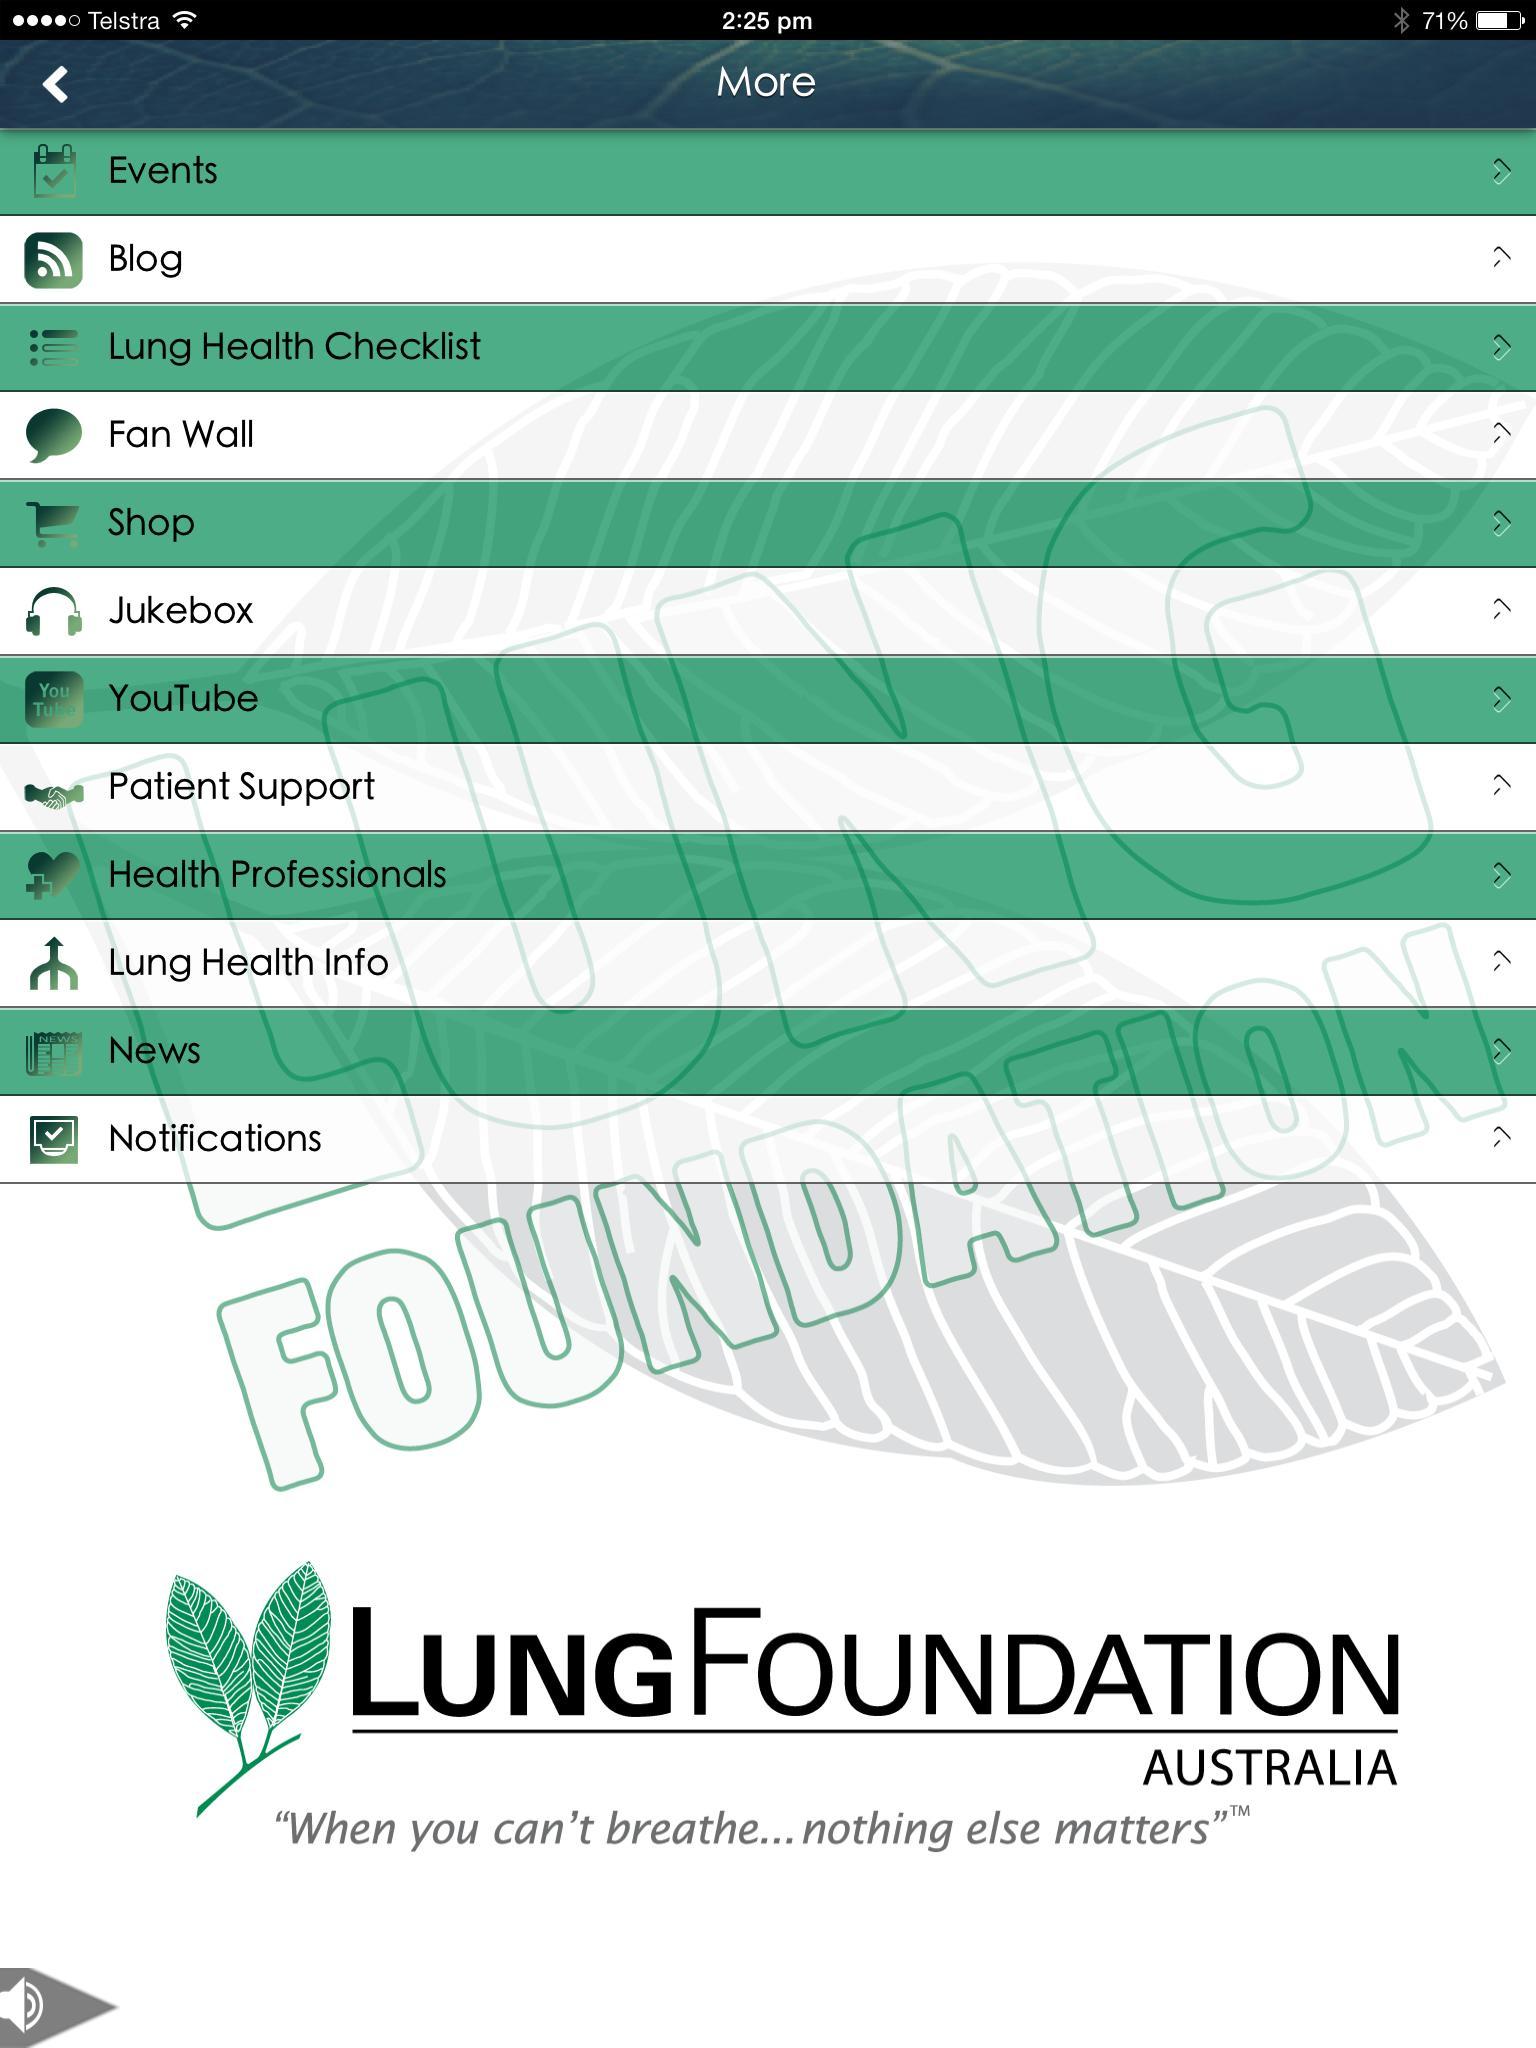 Lung Foundation Australia poster